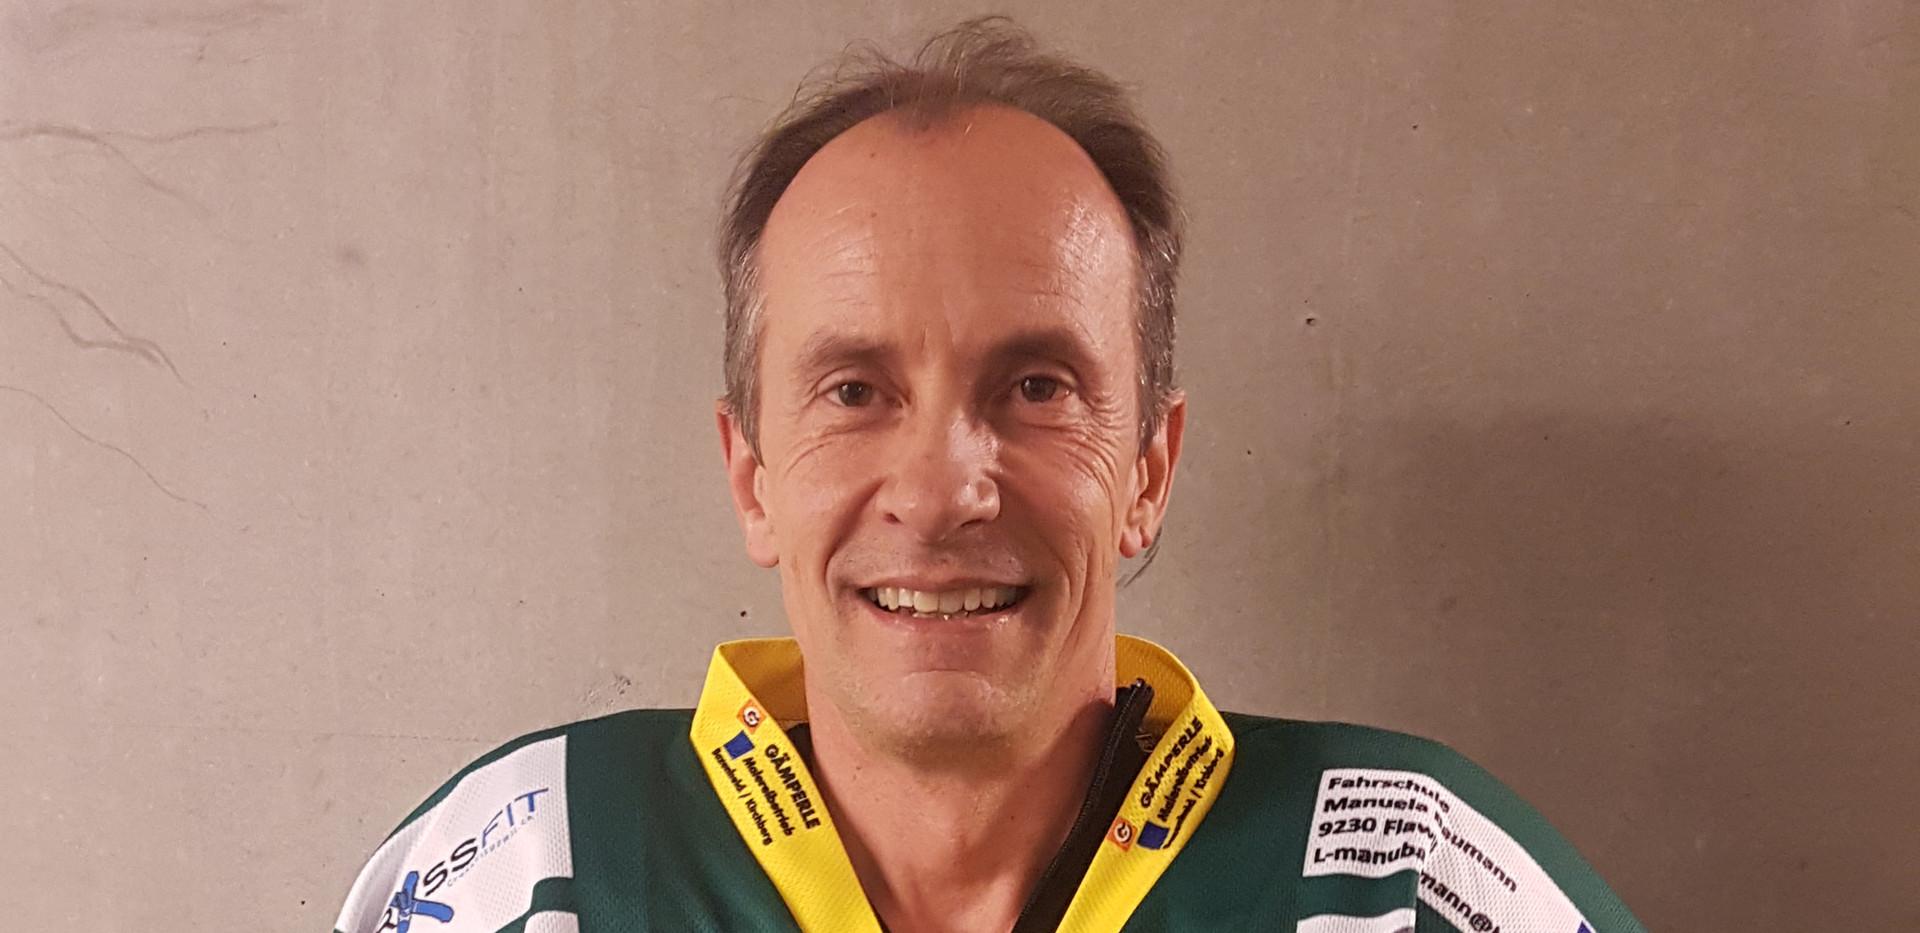 Gianfranco Triulzi #35